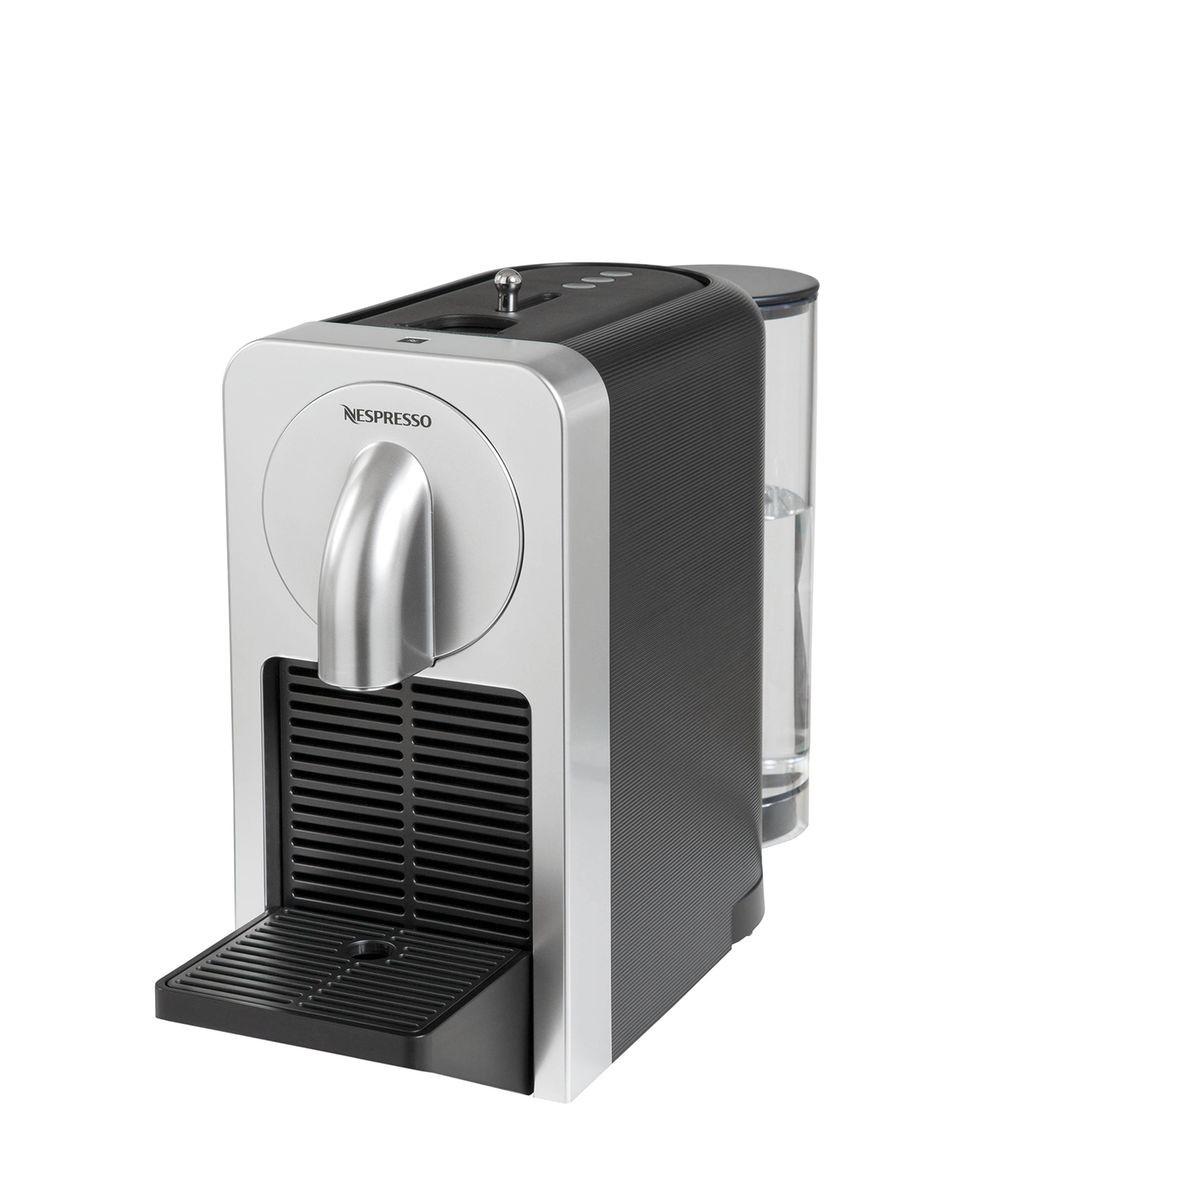 adh rents macif machine caf nespresso magimix. Black Bedroom Furniture Sets. Home Design Ideas